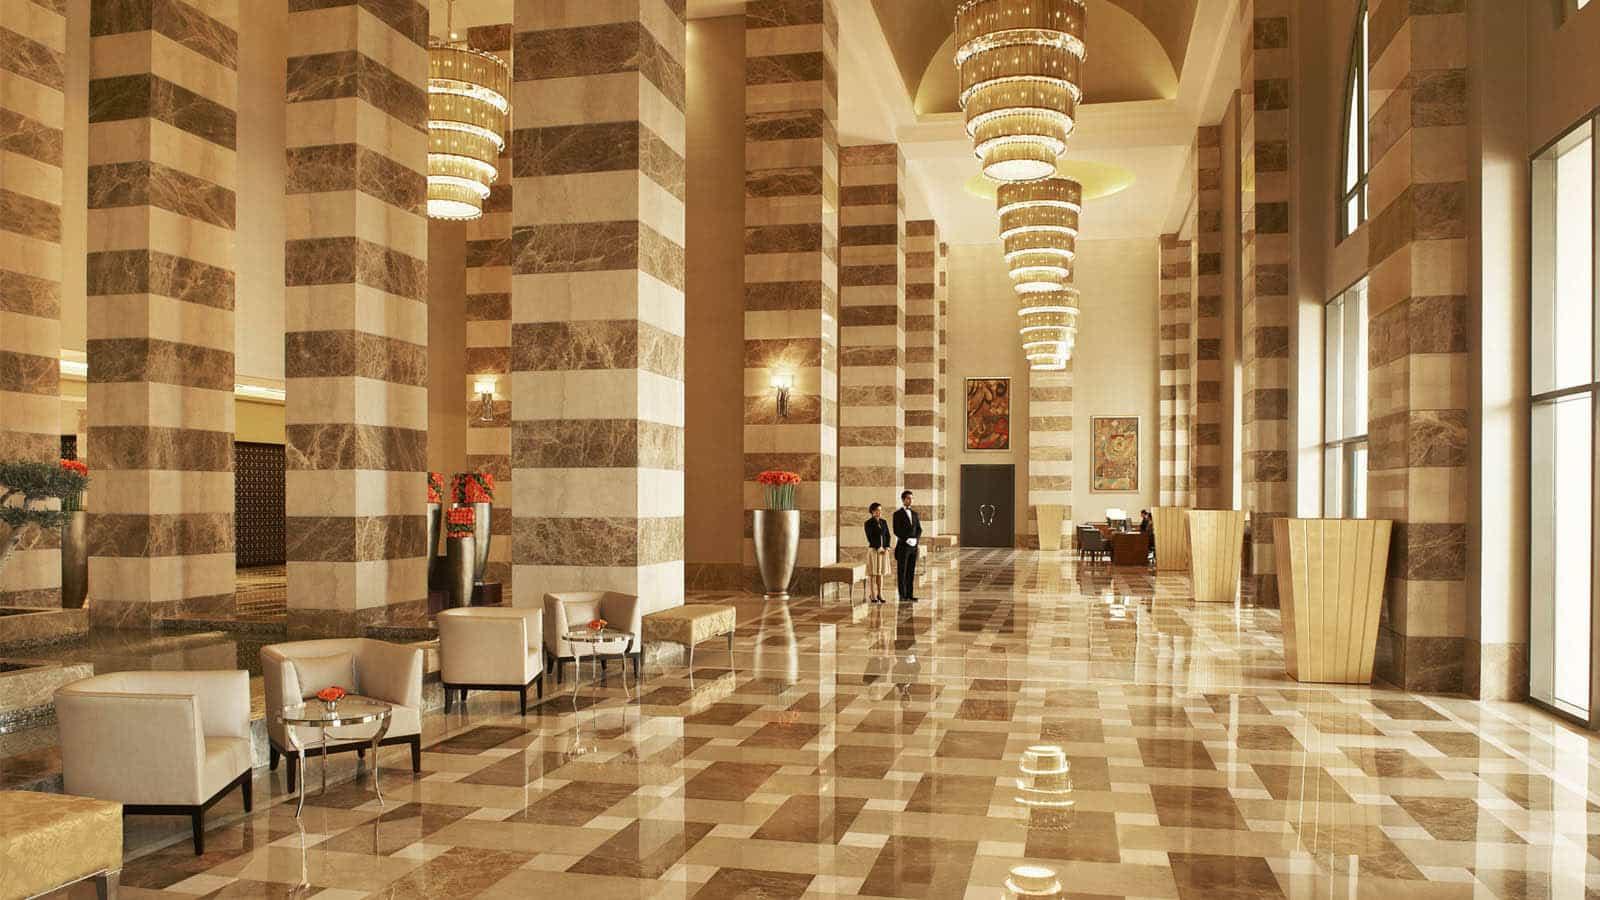 St Regis Doha inside hotel lobby view